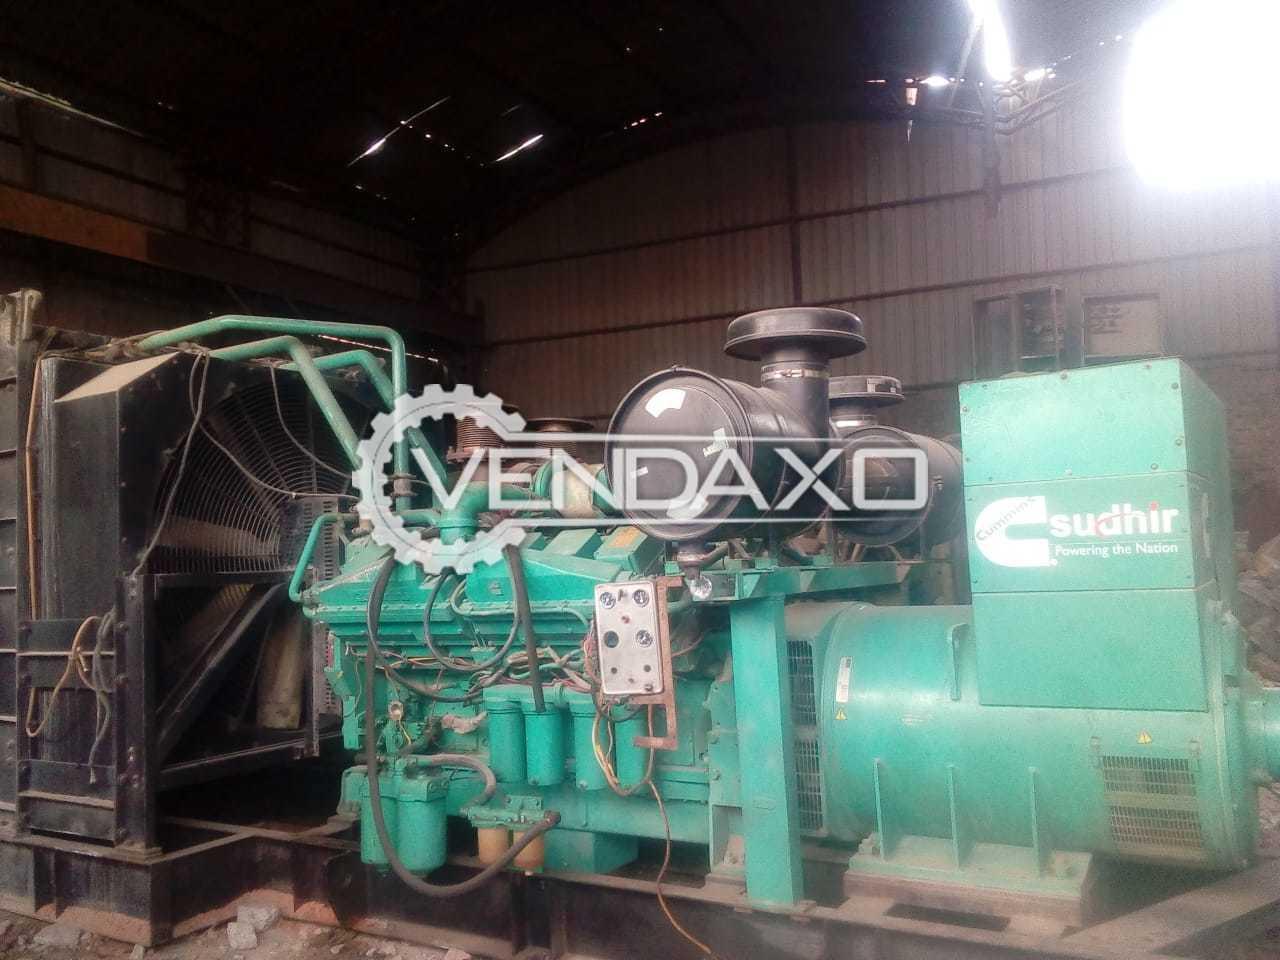 Cummins Diesel Generator - 1010 Kva, 2013 Model With Canopy